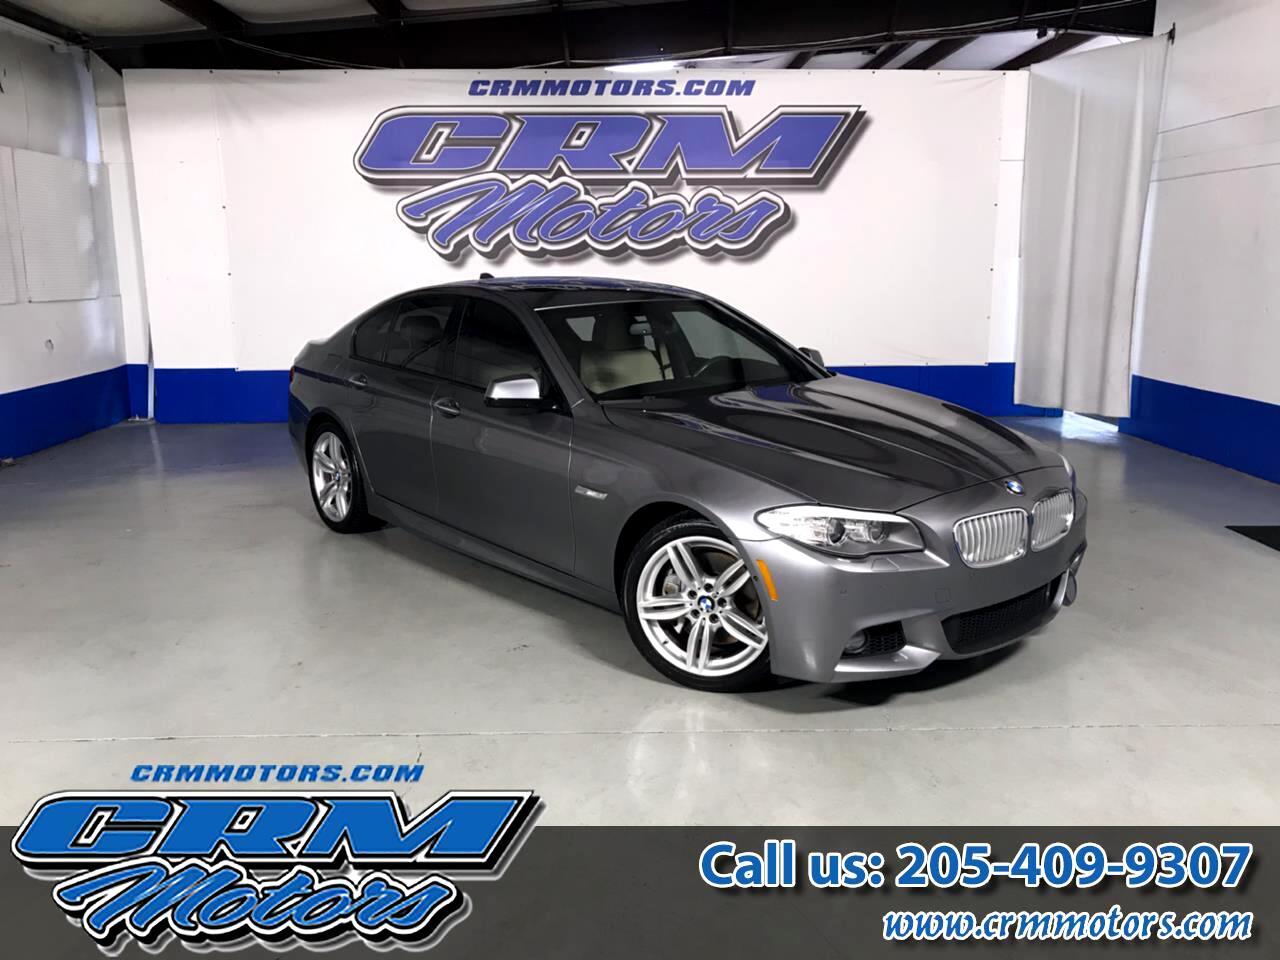 2013 BMW 5 Series 4dr Sdn 550i RWD